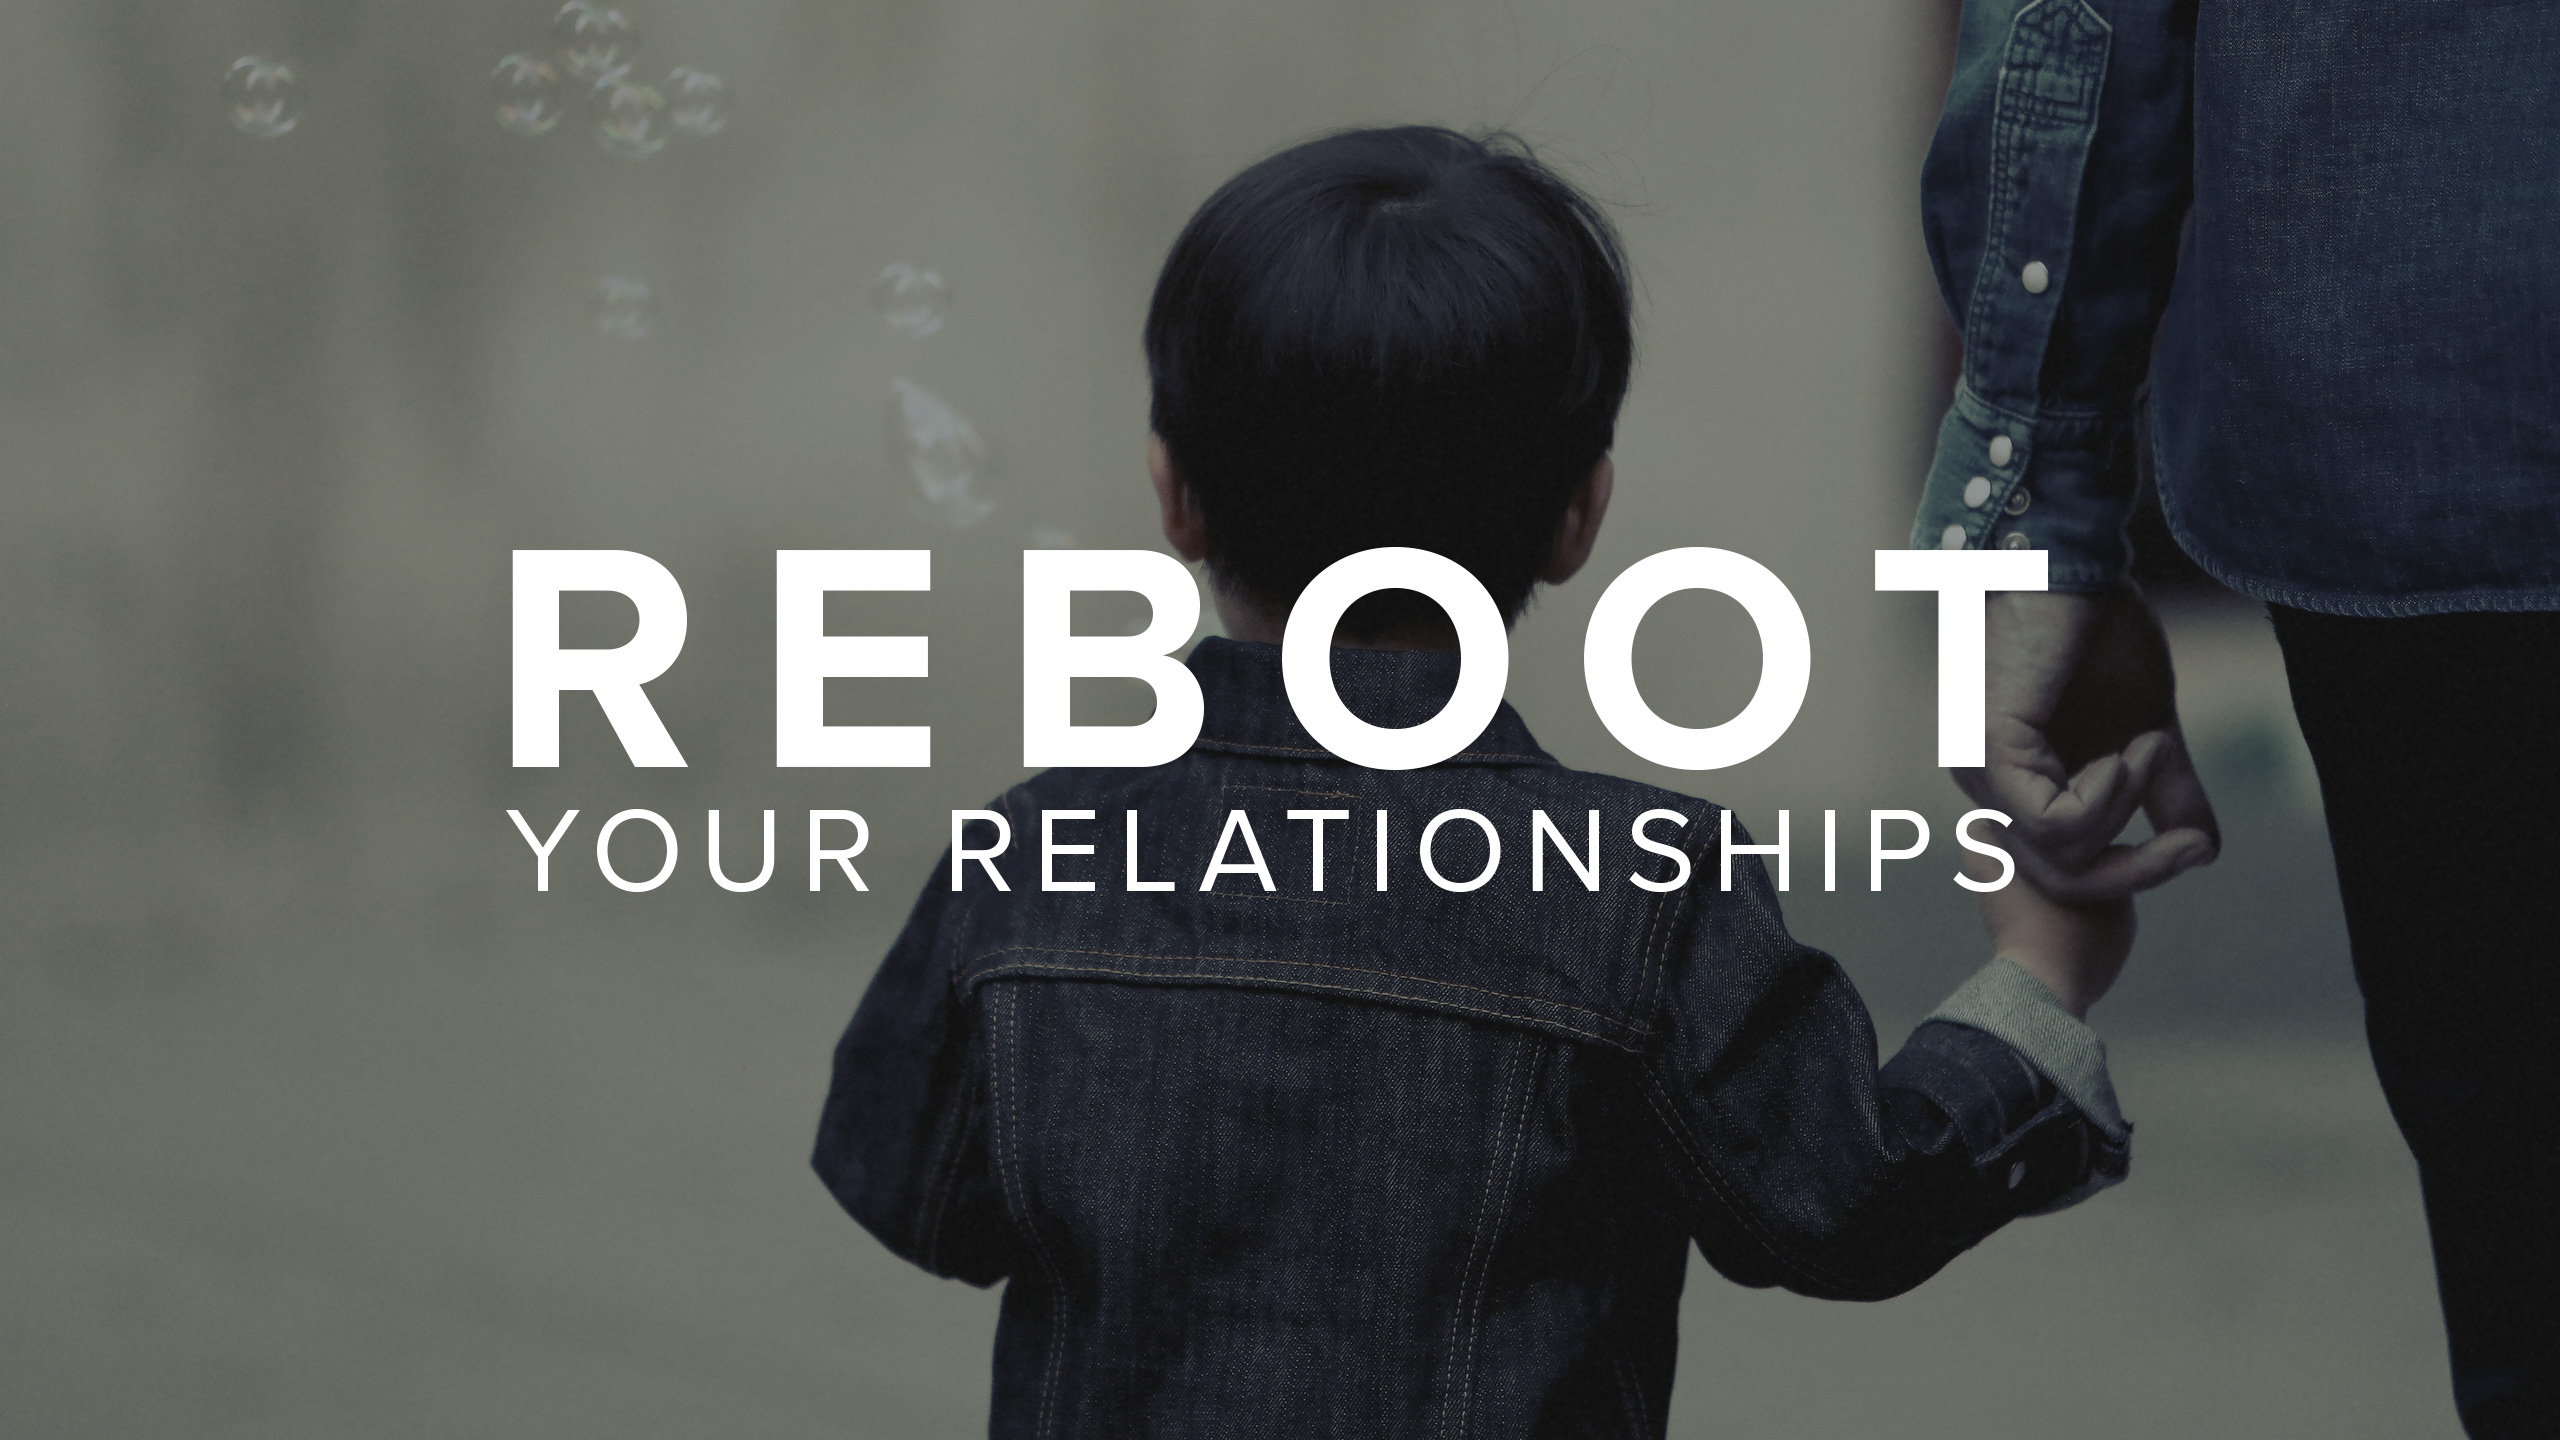 Reboot Your Relationships